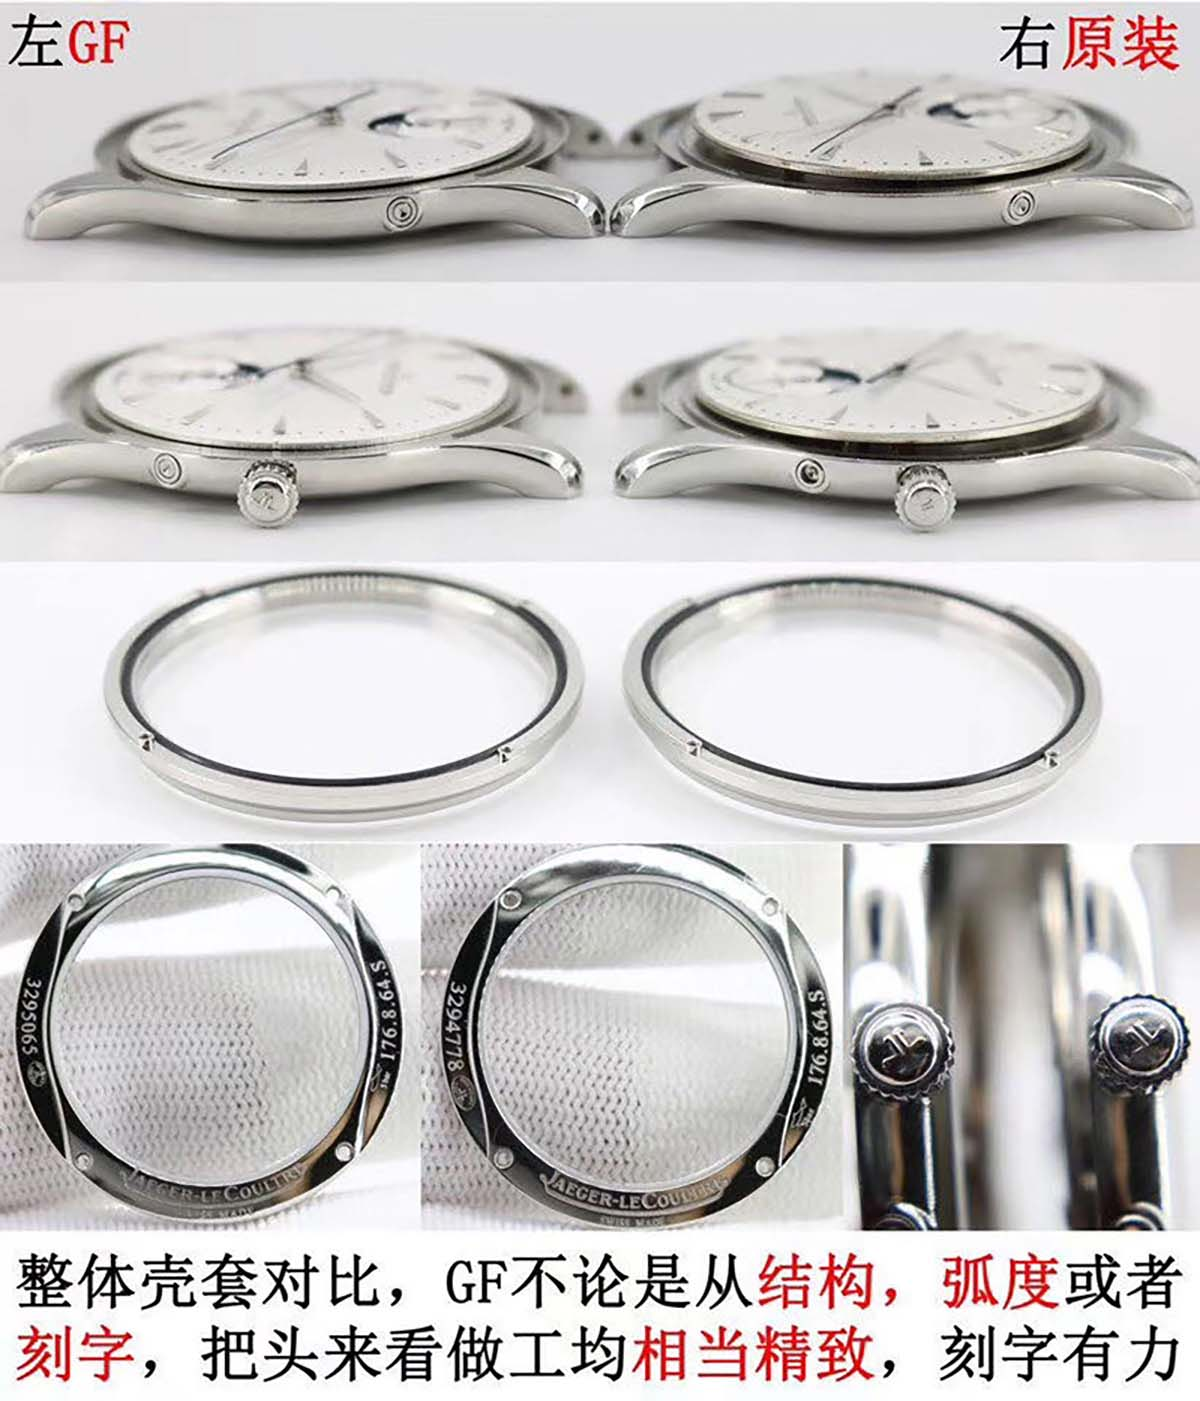 GF厂积家月相大师系列白盘复刻腕表做工细节深度评测-品鉴GF厂复刻